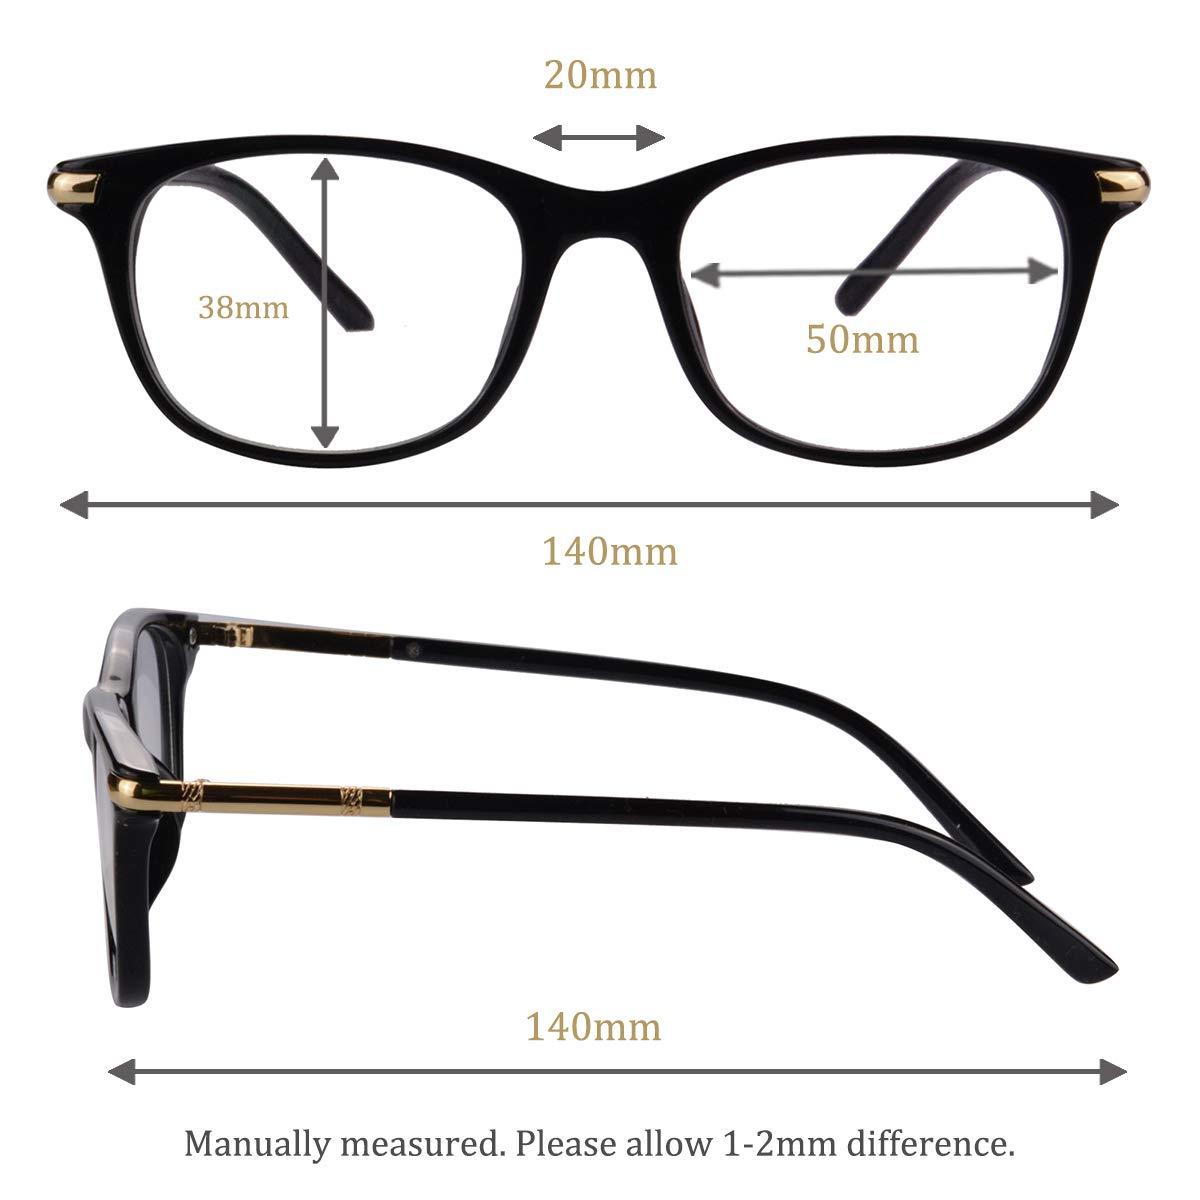 38ab311b4a Amazon.com  UOOUOO TR90 Lightweight Blue Light Blocking Glasses  Anti-fatigue Computer Eyewear-017(Blue coating lens